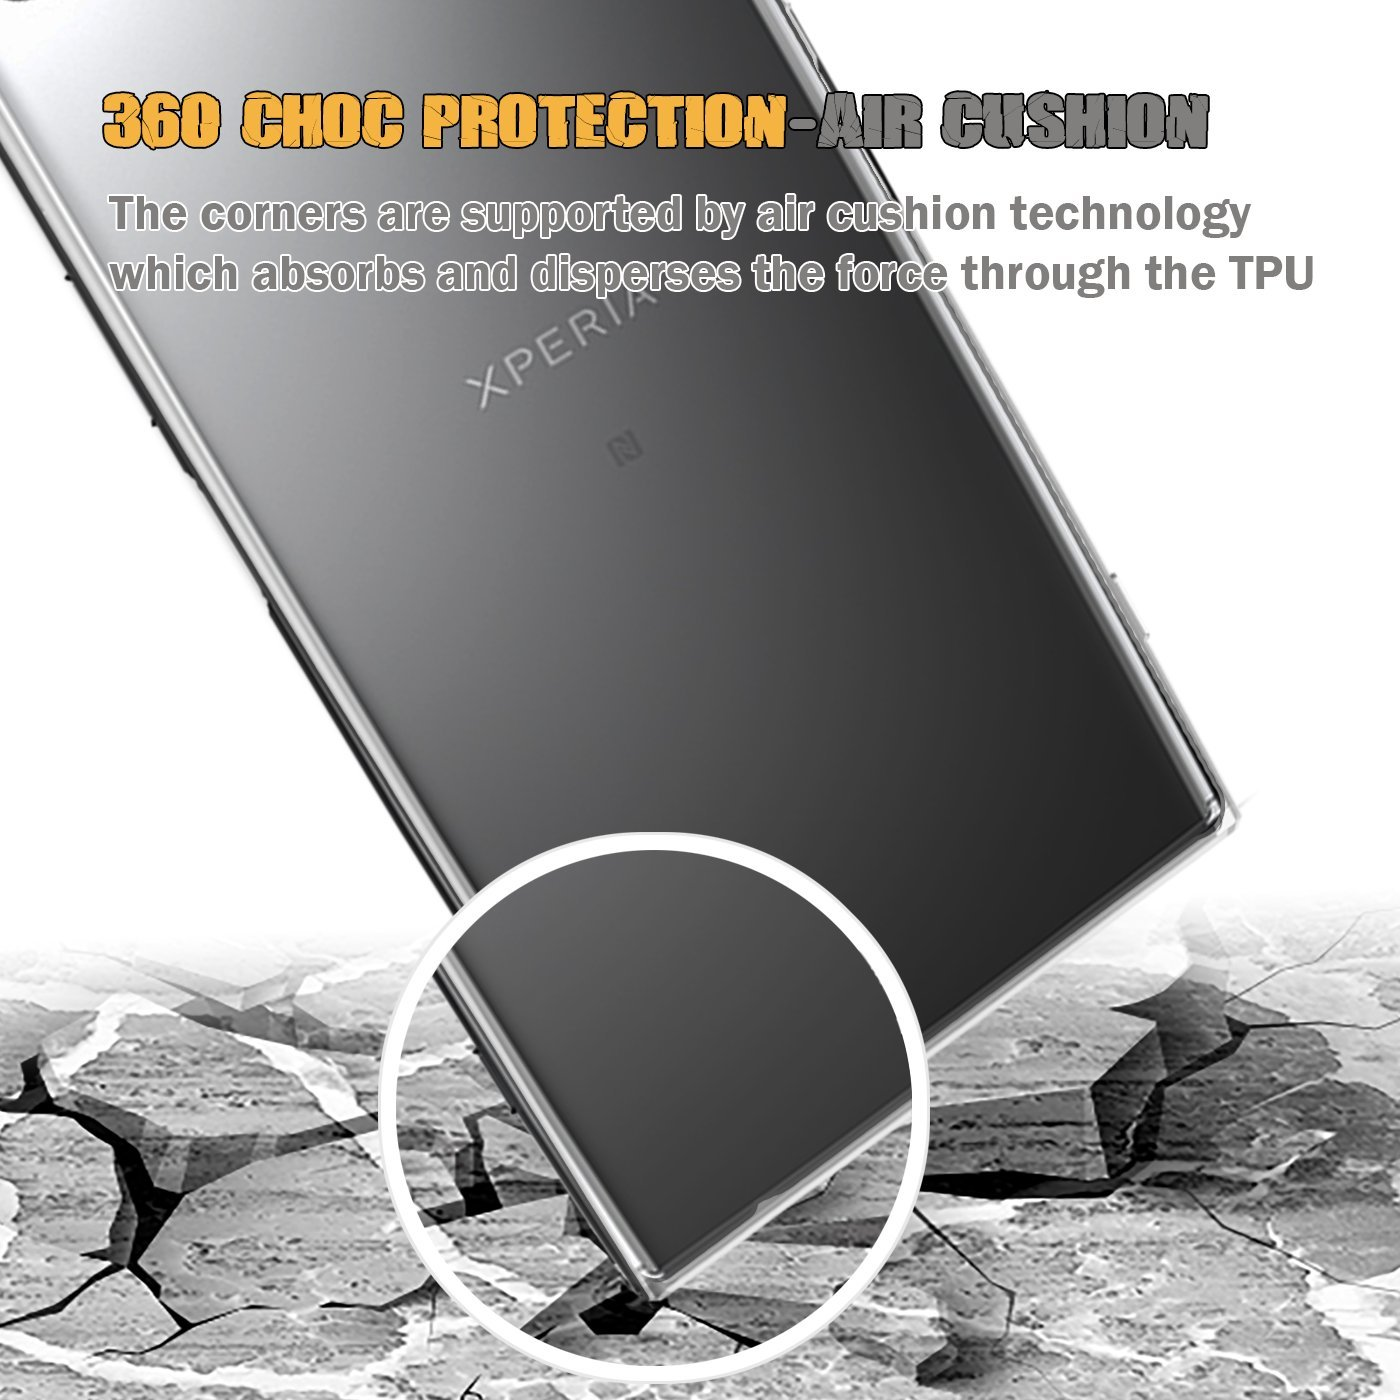 Etui Ultra Mince Transparent Invisible pour Sony Xperia XZ1 Buyus Coque Gel Sony Xperia XZ1 Coque 360 Degres Protection Integral Anti Choc Coque Xperia XZ1